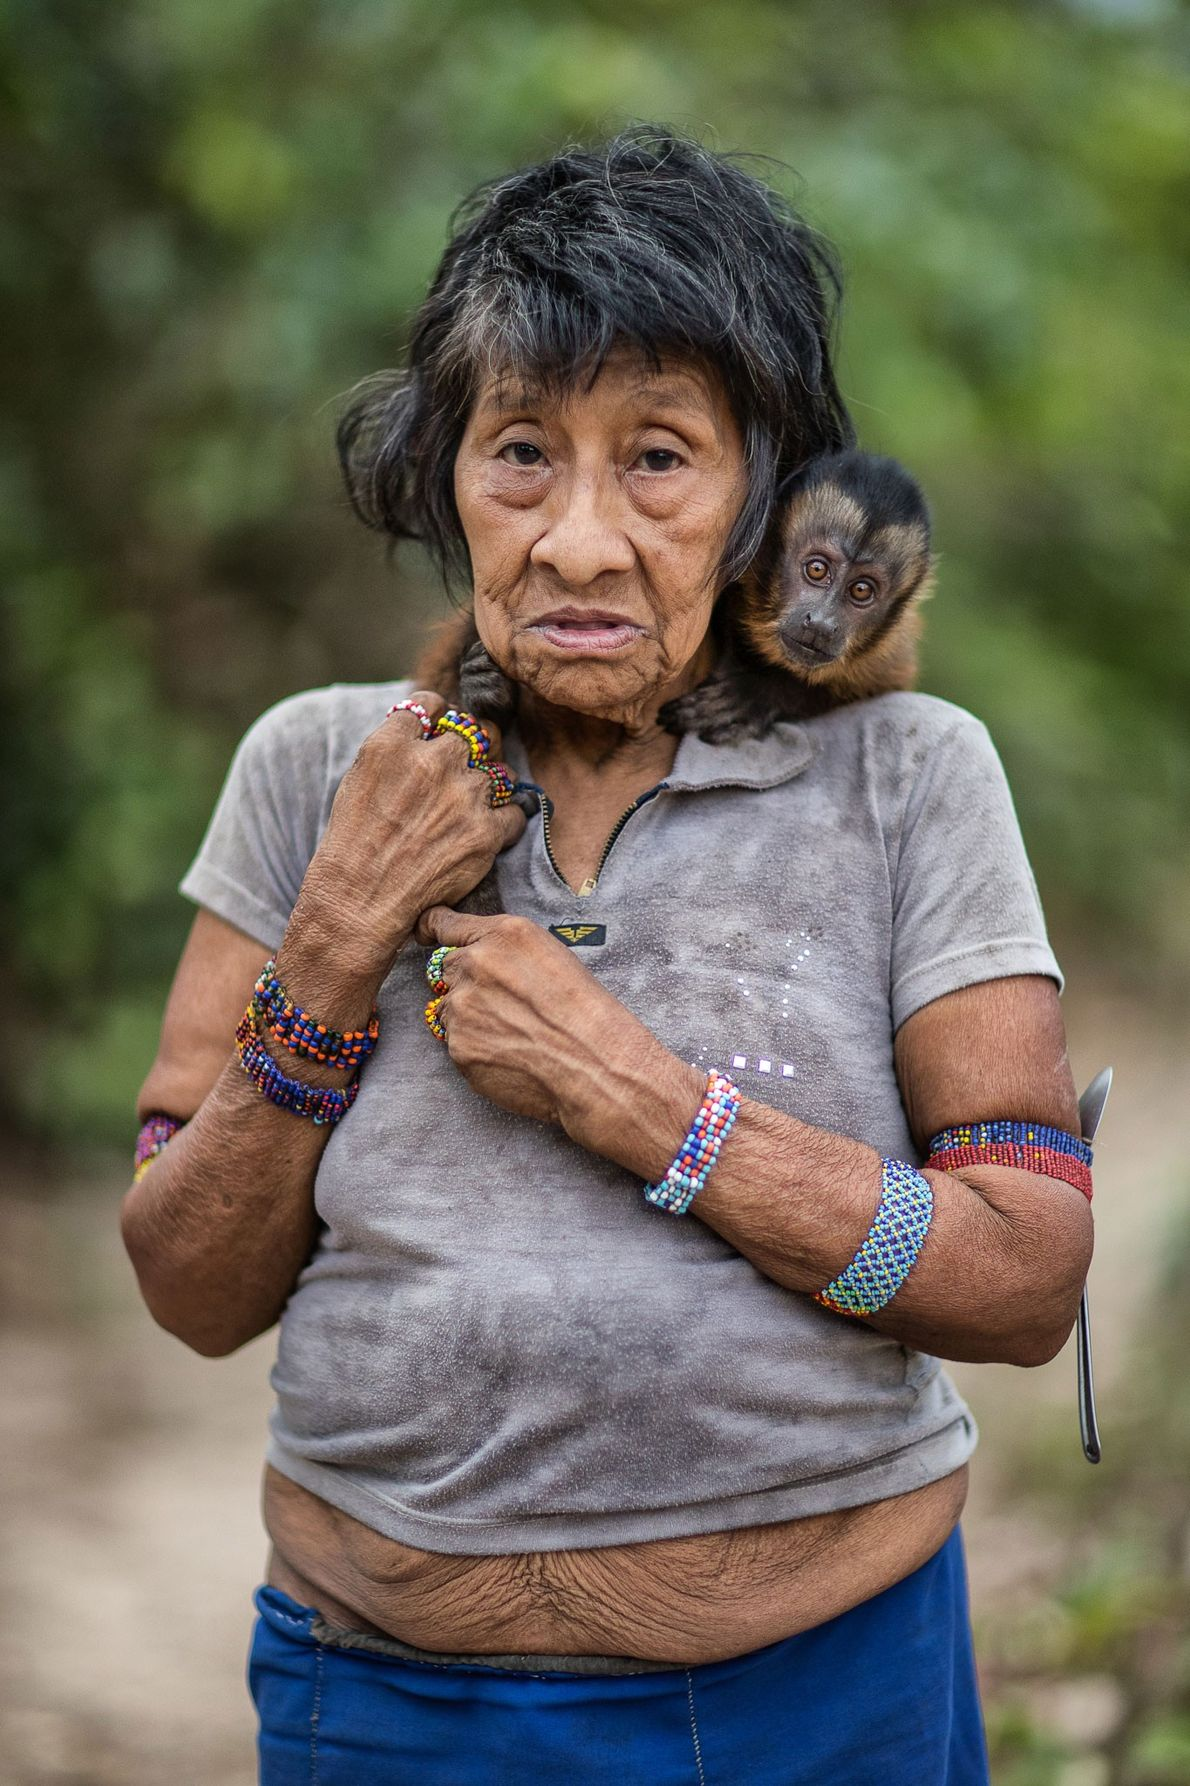 Amápiranawy ia am Fluss Káru. Juriti, Awã-Gemeinschaft, Brasilien